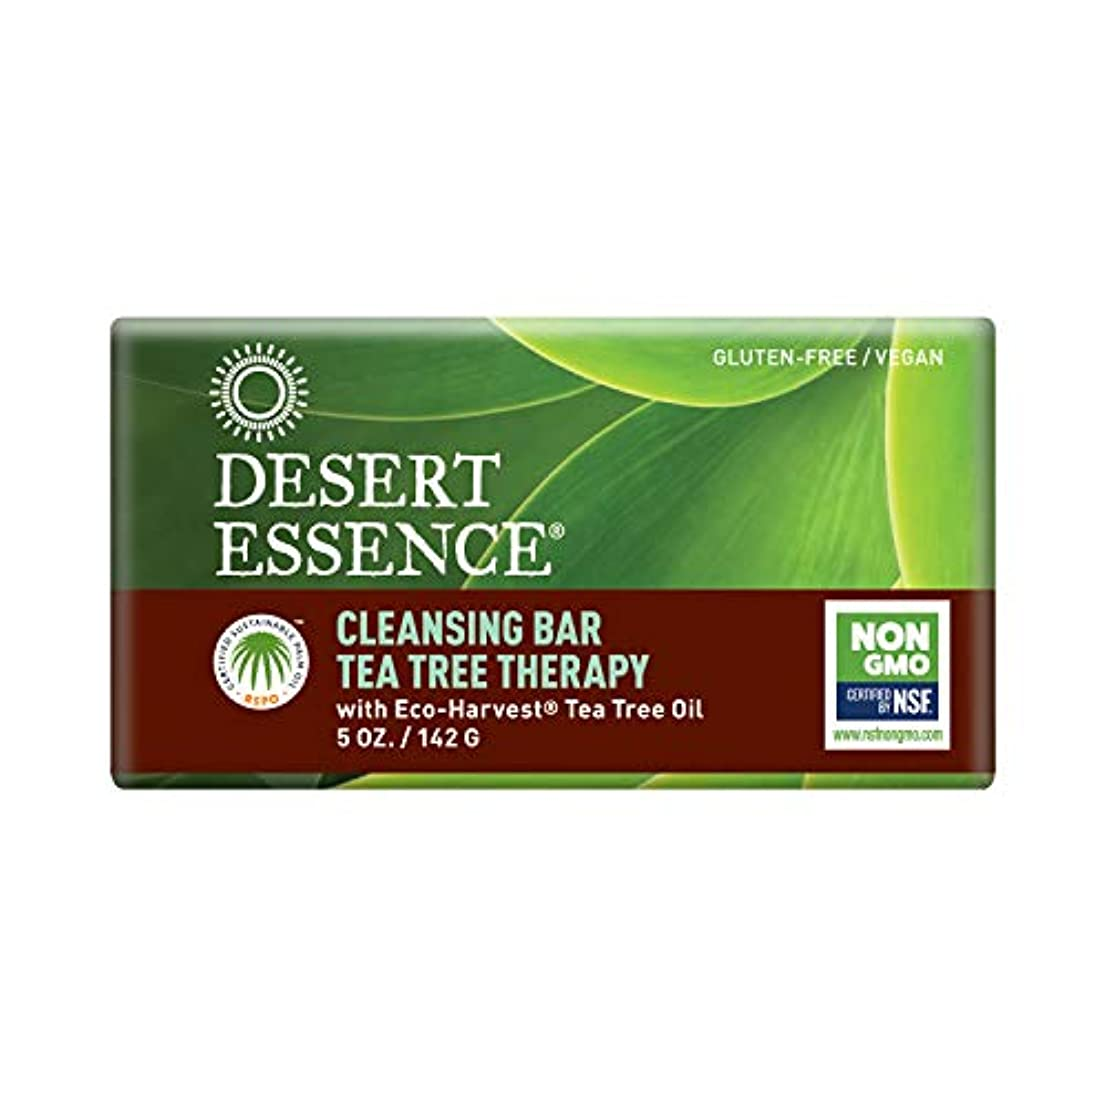 基本的な定説配偶者海外直送品Desert Essence Tea Tree Therapy Cleansing Bar Soap, 5 oz